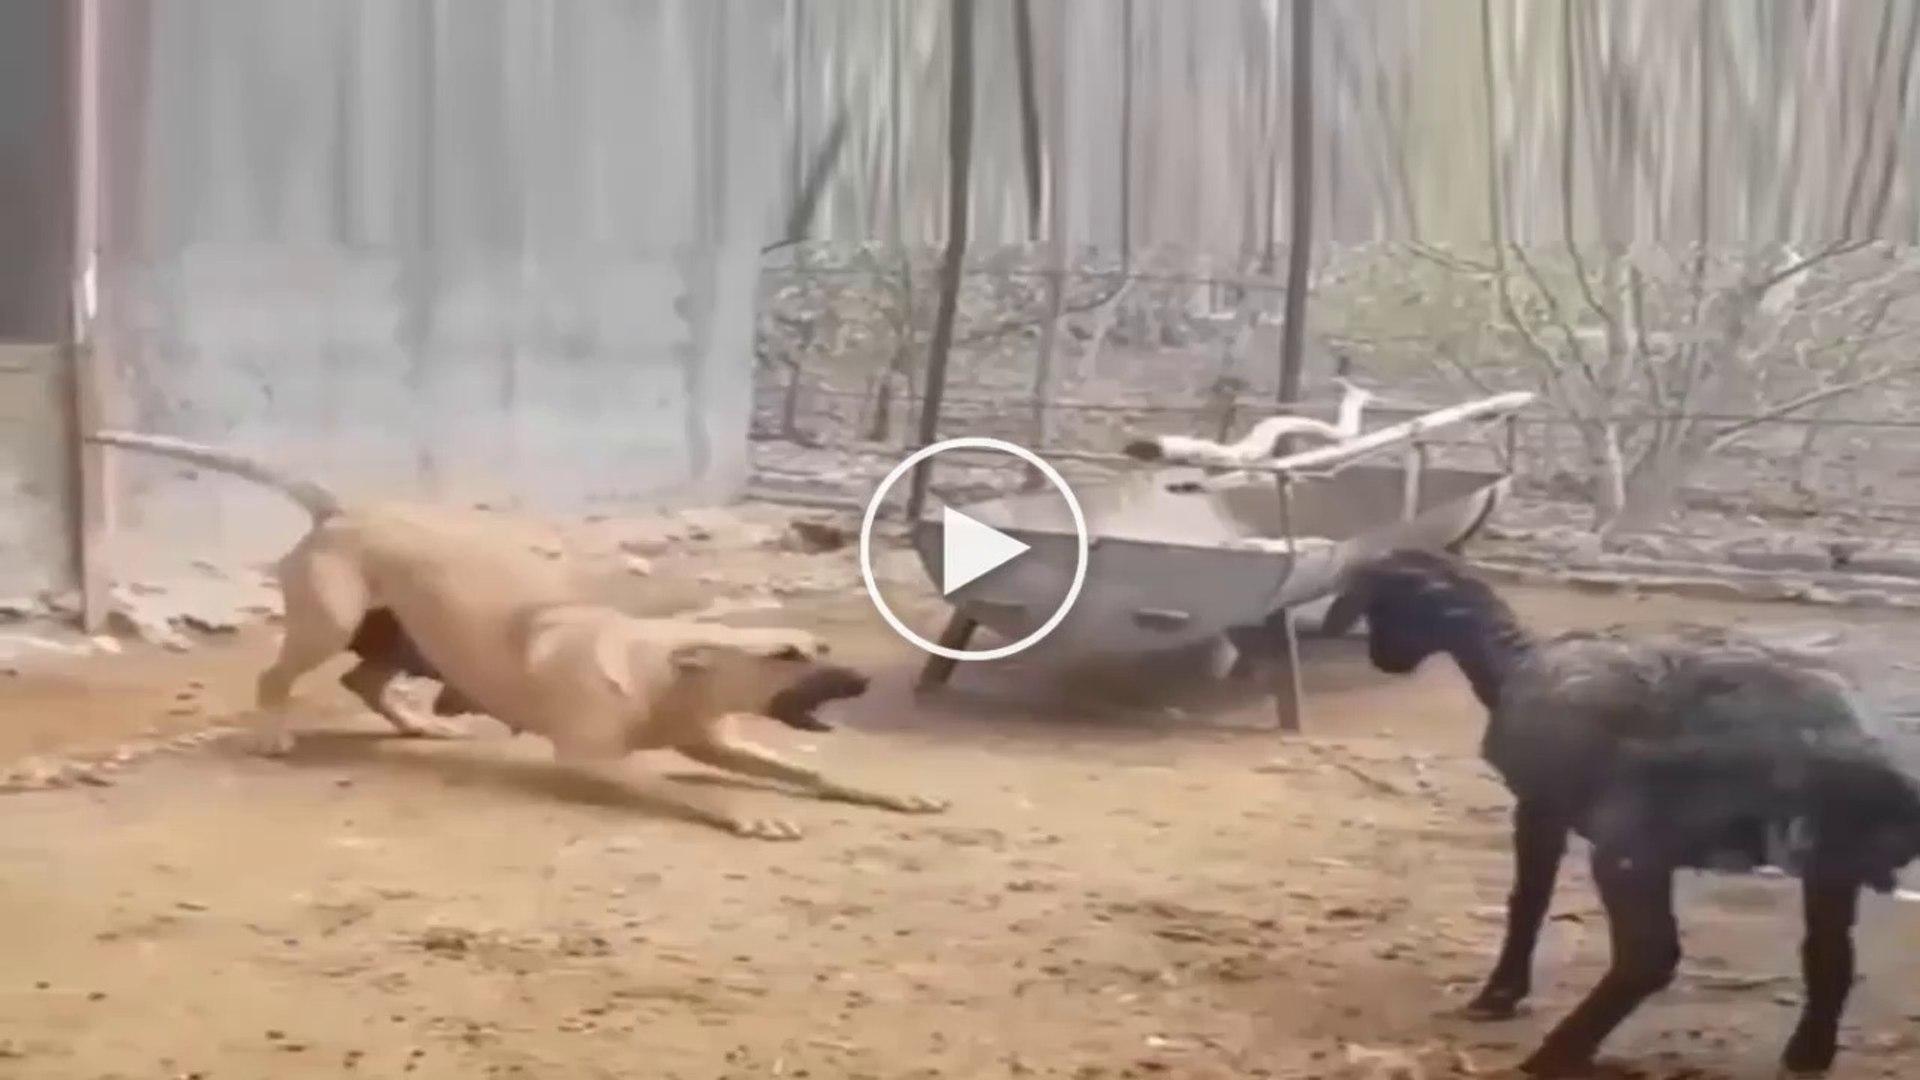 KOYUN vs ANADOLU COBAN KOPEGi - SHEEP vs ANATOLiAN SHEPHERD DOG